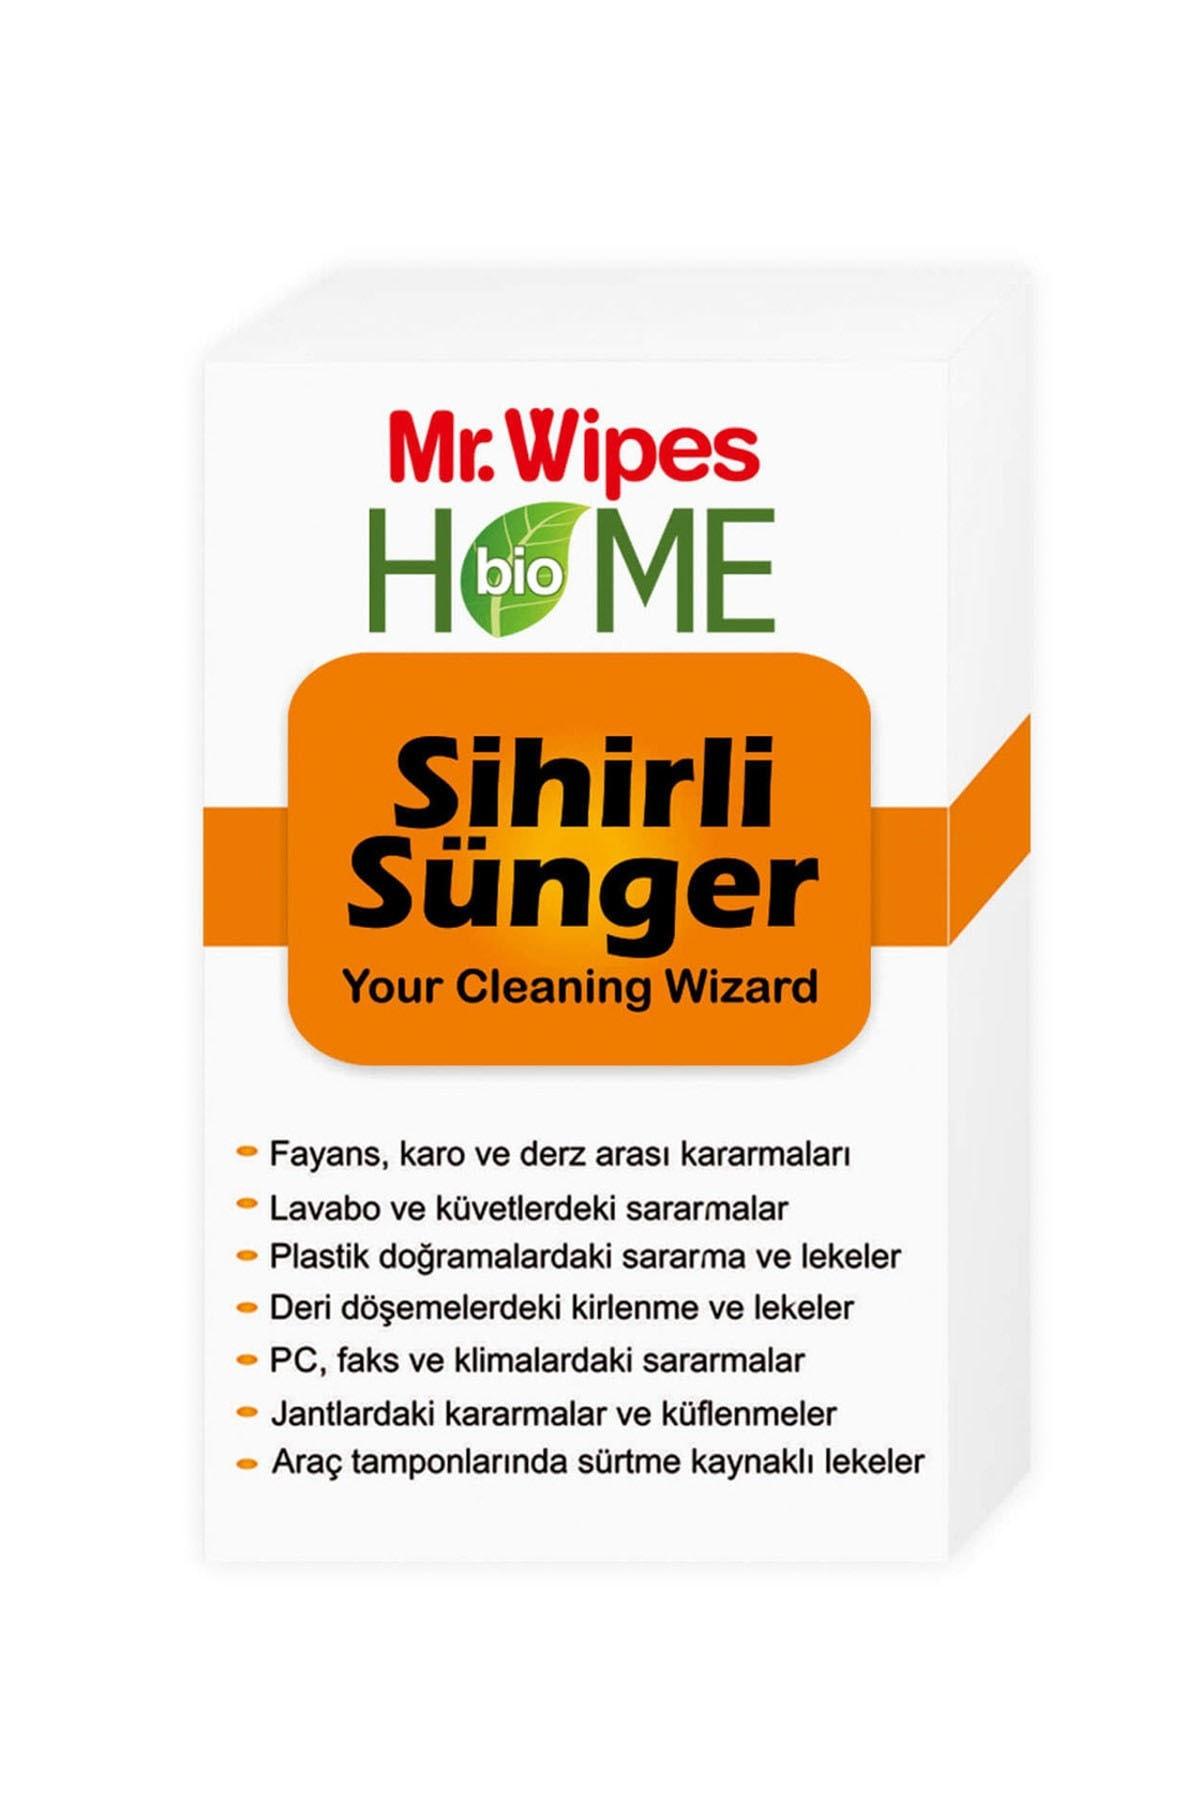 Farmasi Mr. Wipes Sihirli Sünger 8690131406592 1